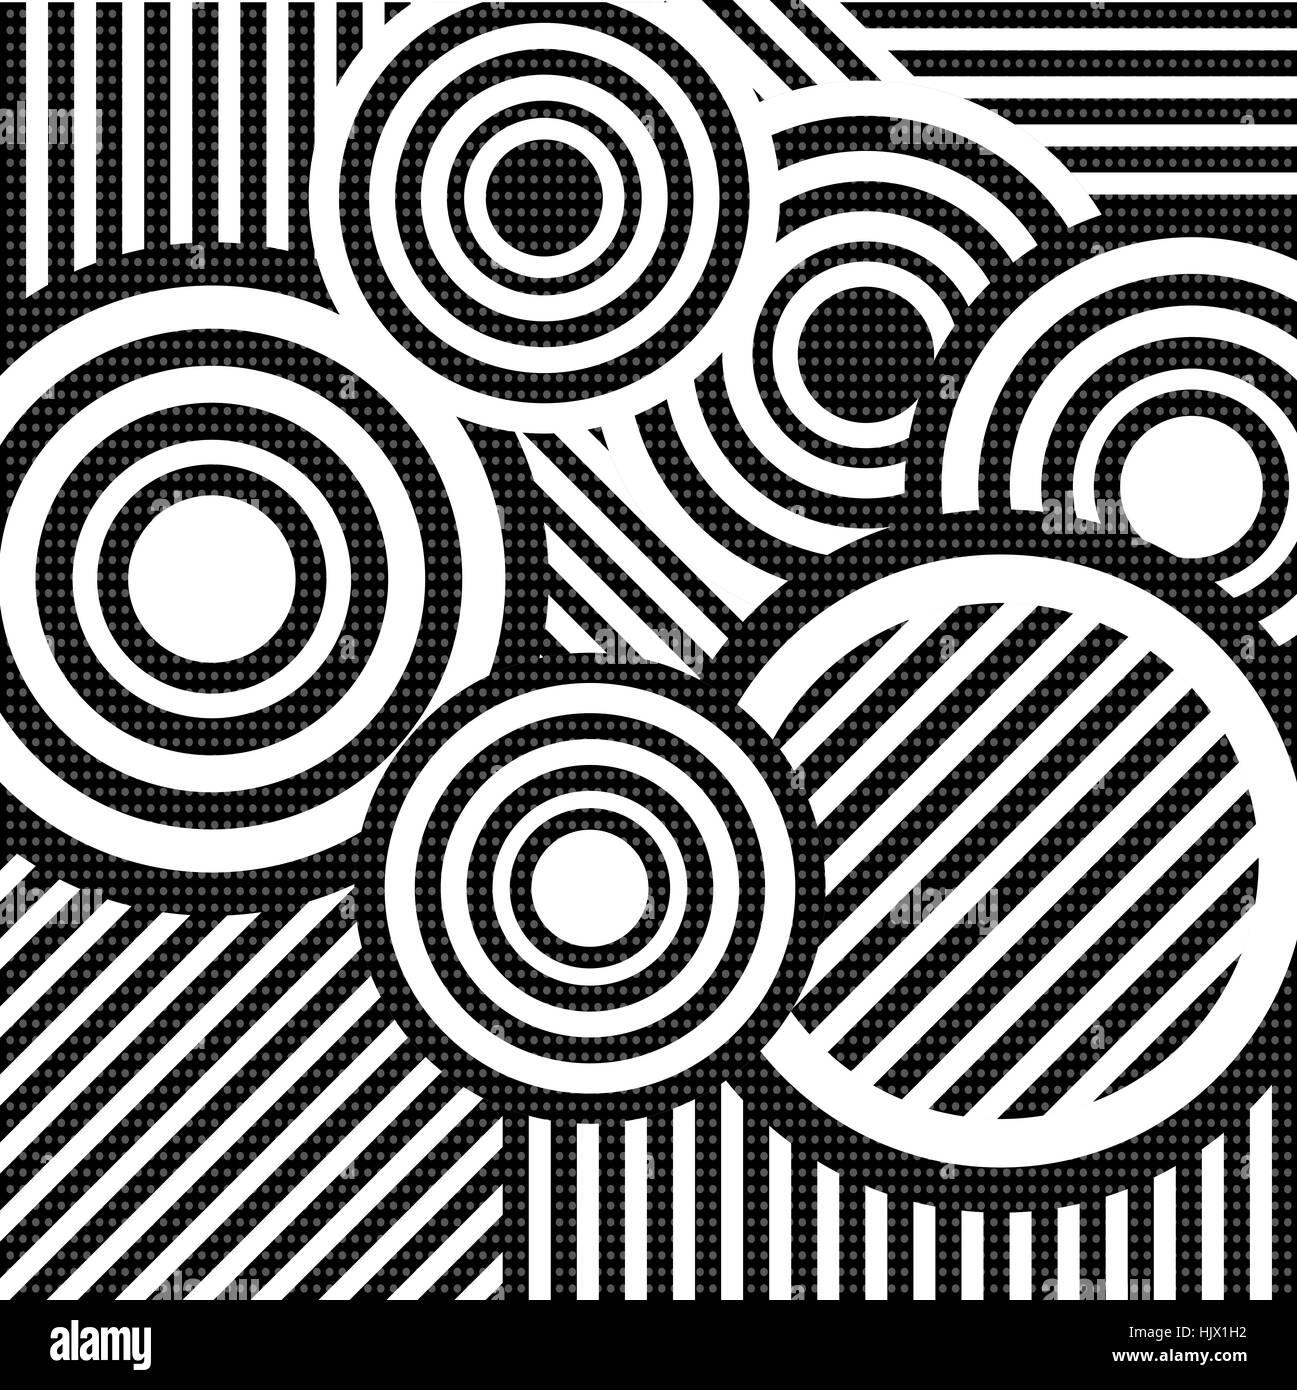 Retro Wallpaper Black And White Stock Photos Images Alamy